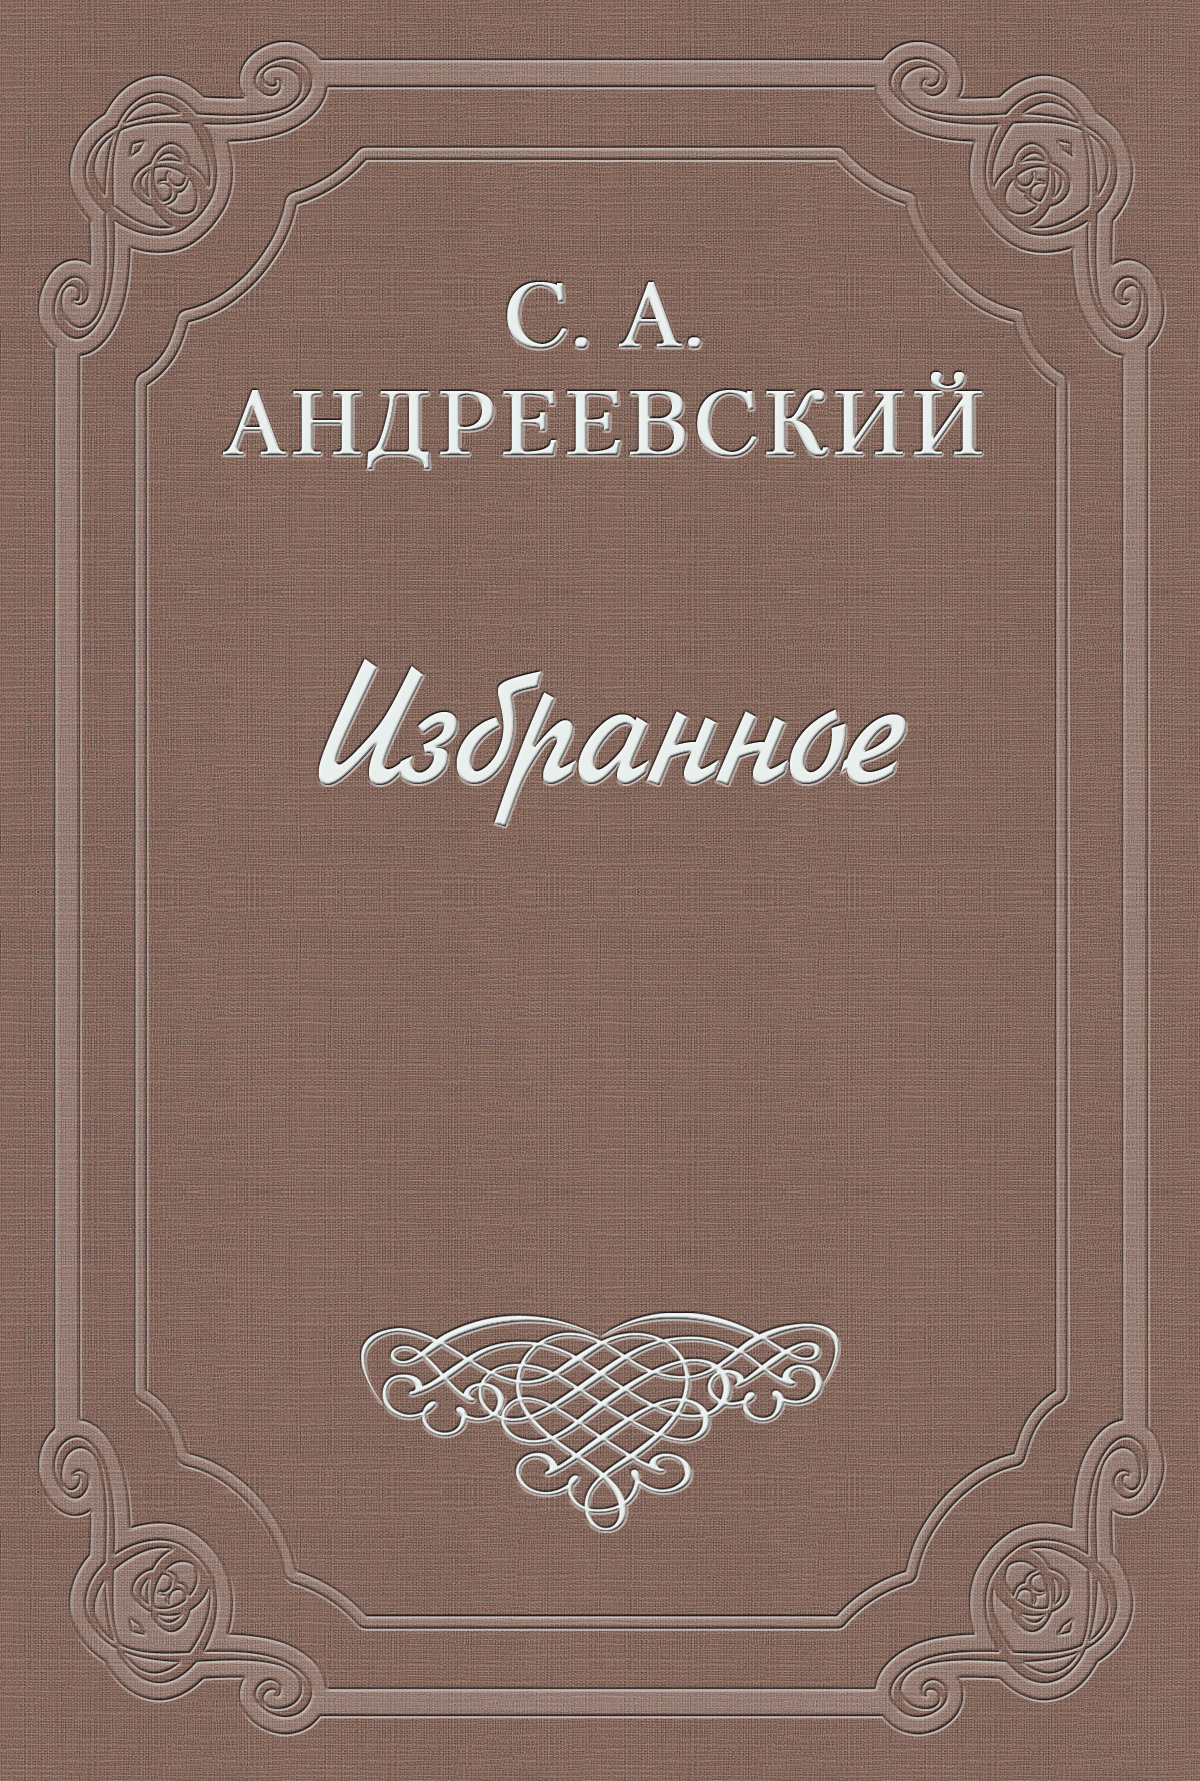 Сергей Андреевский Город Тургенева л с утевский молодые годы ивана тургенева